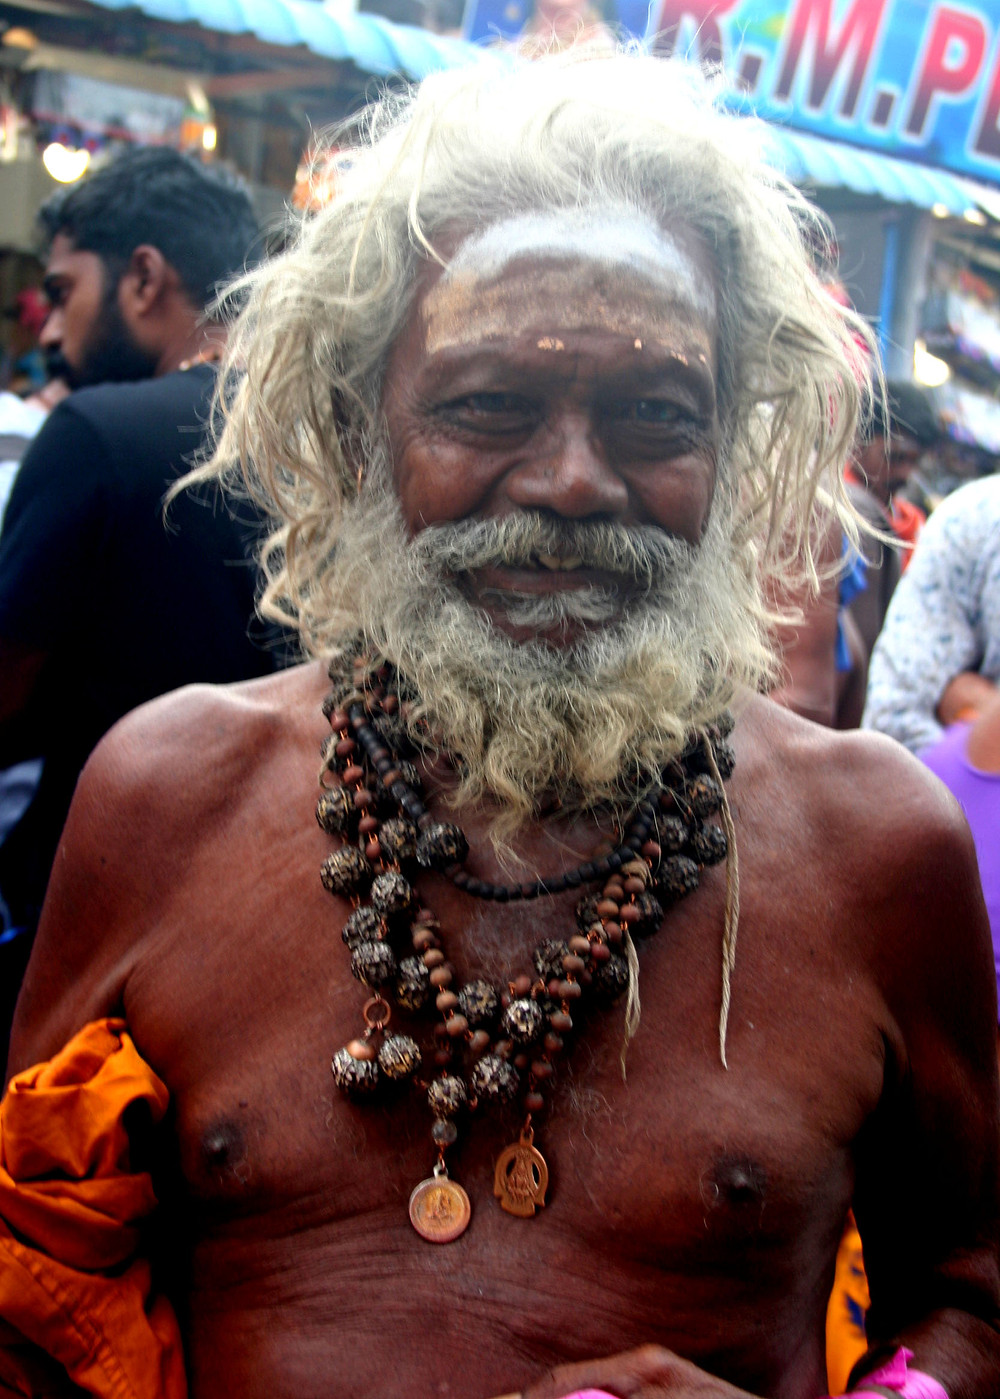 Sanyasin fuori dal Tiruparankundram temple a 8 km da Madurai (India - Tamil Nadu, Kerala, Karnataka - novembre/dicembre 2017)